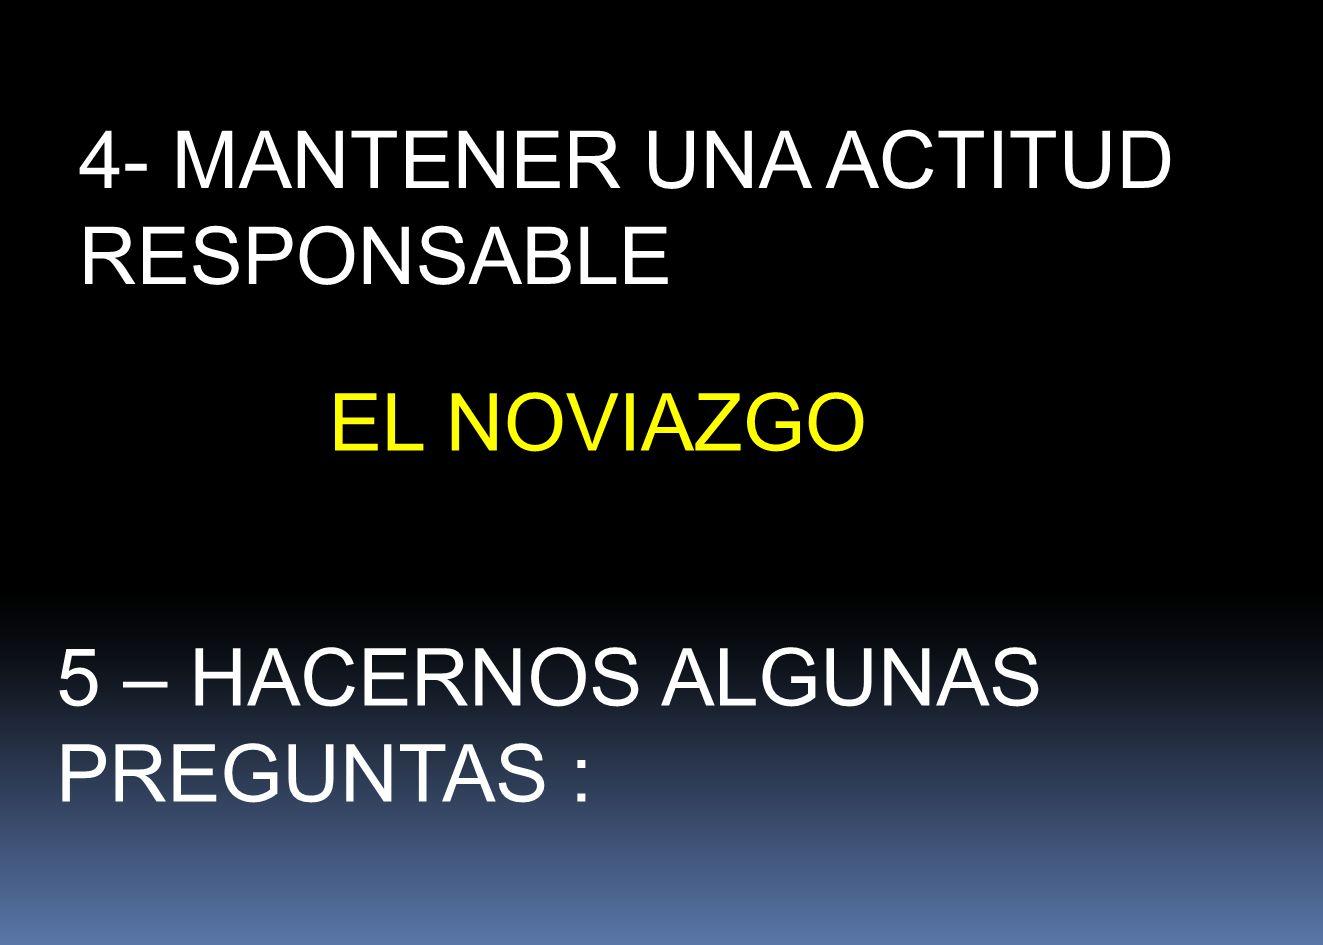 4- MANTENER UNA ACTITUD RESPONSABLE